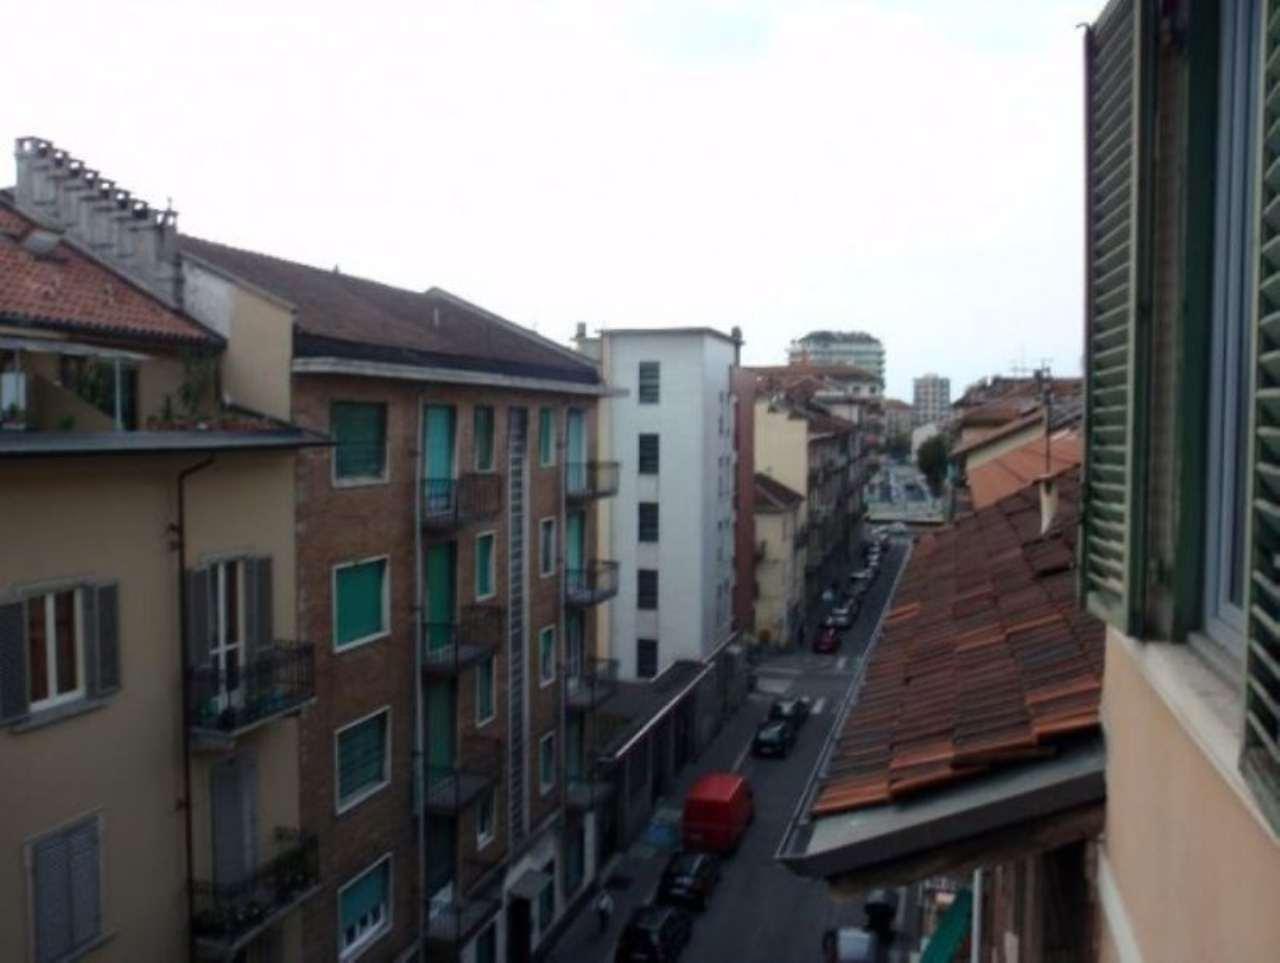 Bilocale Torino Zona Valdocco / Via Brindisi, 15 7